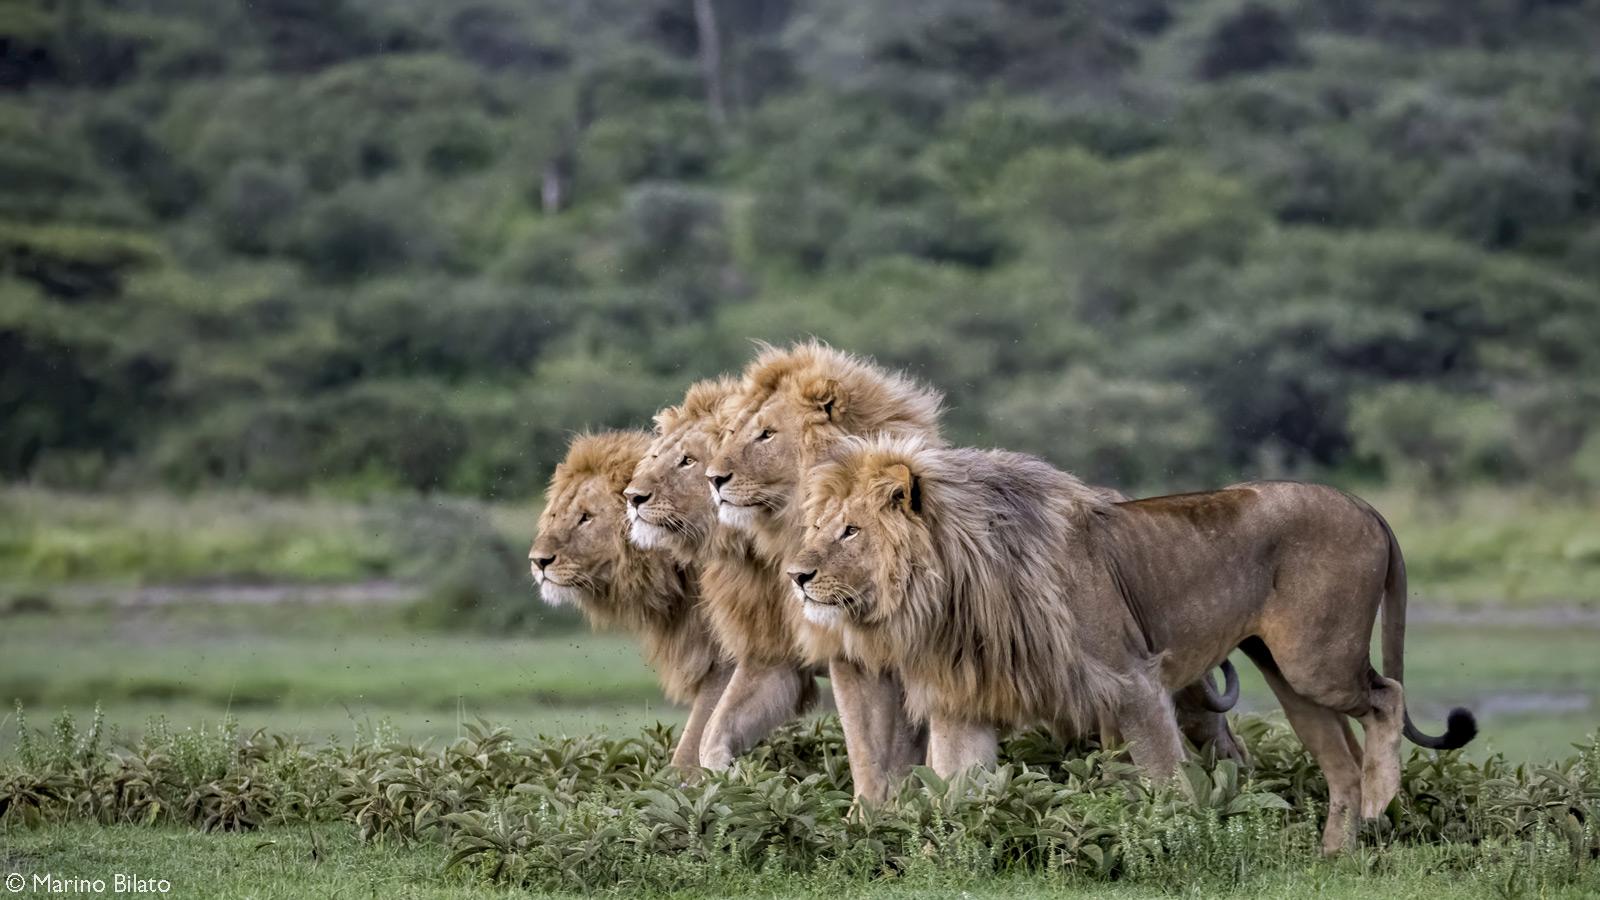 A coalition of lions intently focus on potential prey. Ndutu, Ngorongoro Conservation Area, Tanzania © Marino Bilato